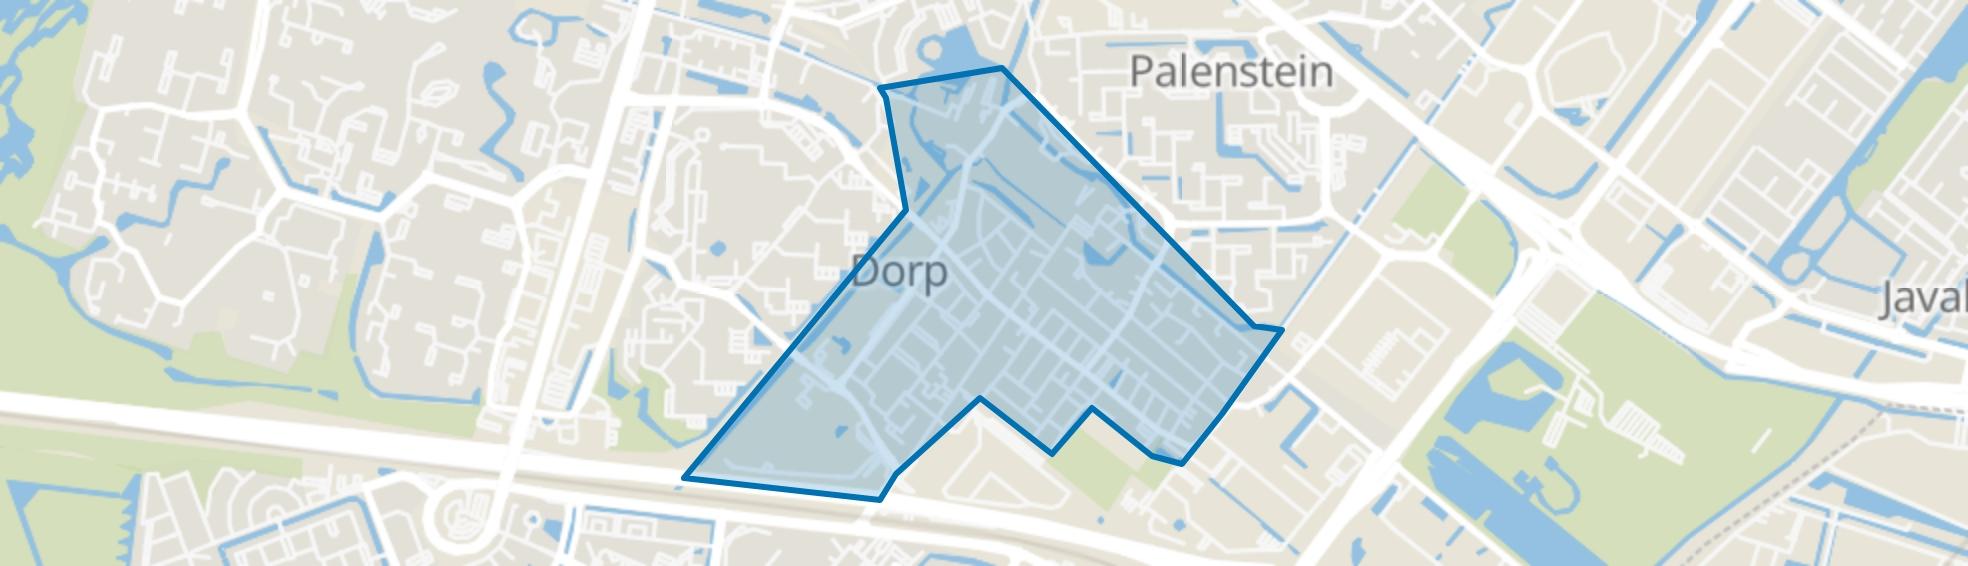 Dorp, Zoetermeer map